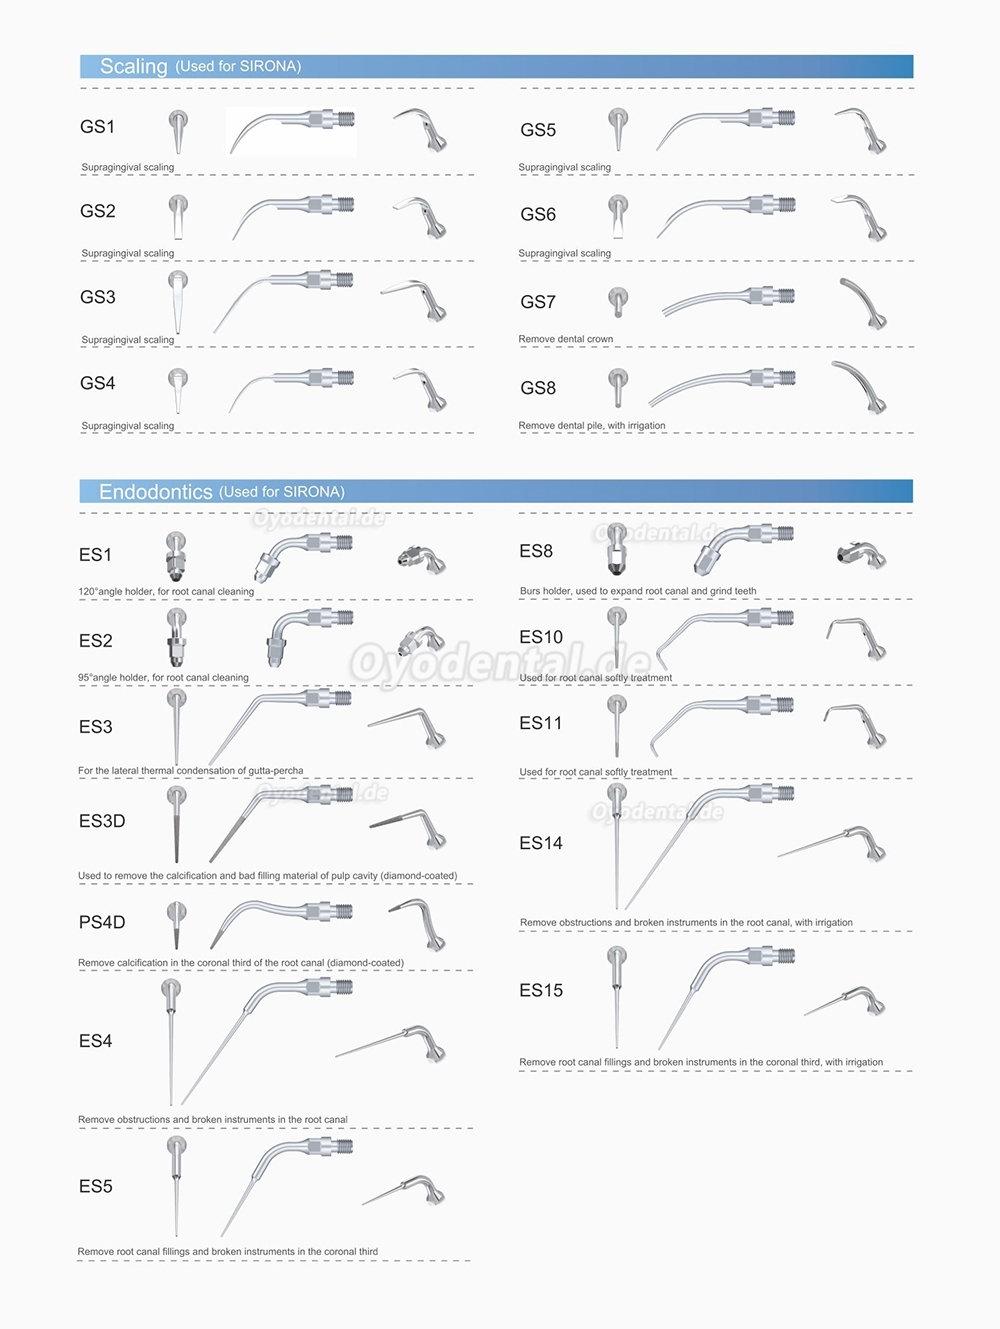 10Pcs Woodpecker Ultraschallspitzen Endodontie Spitzen E1 E2 E3 E3D E4 E4D E5 E5D E8 E9 E10D E11 E11D E14